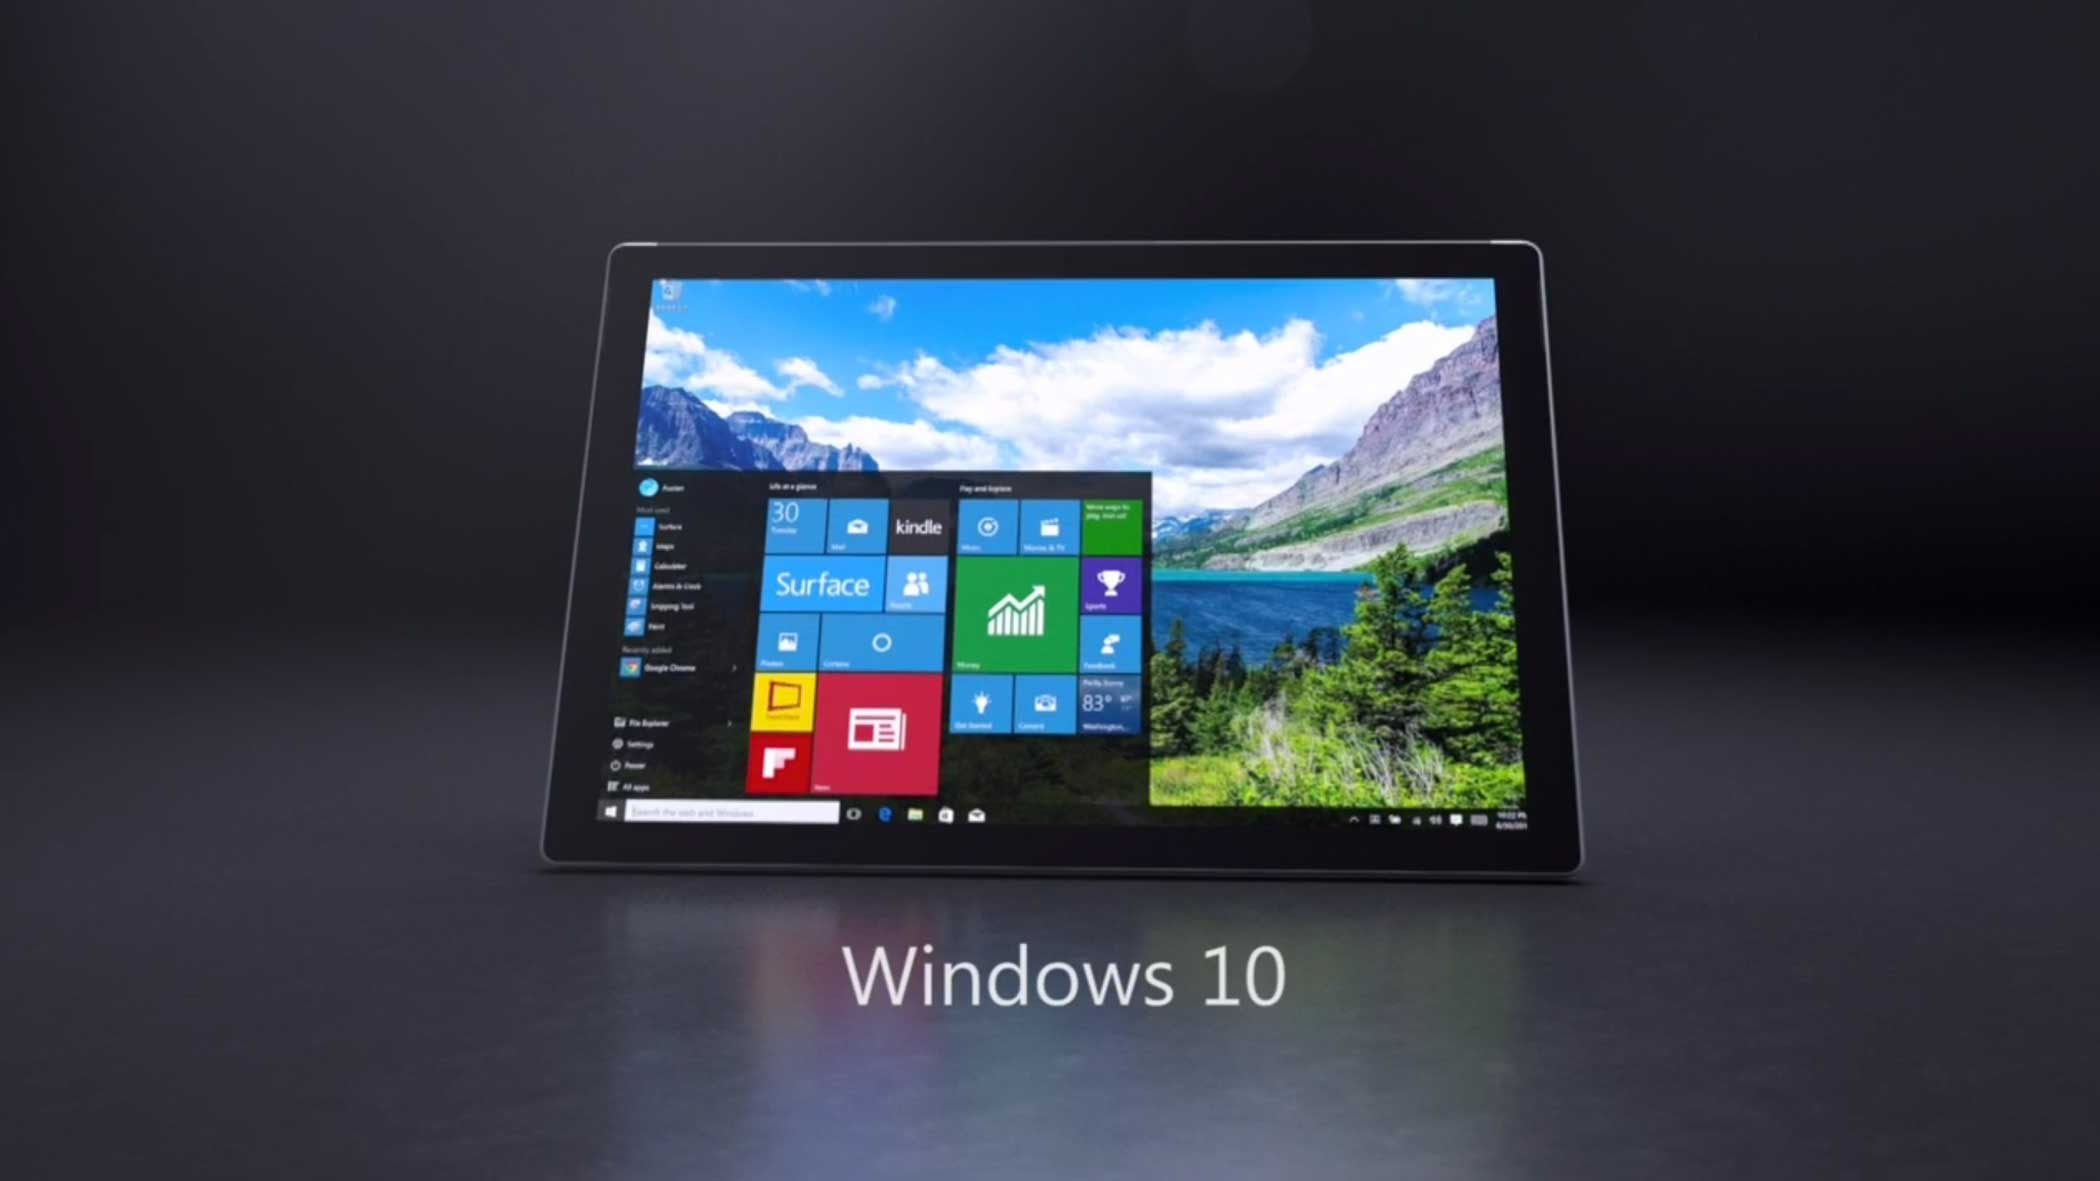 The Surface Pro 4 runs the new Windows 10